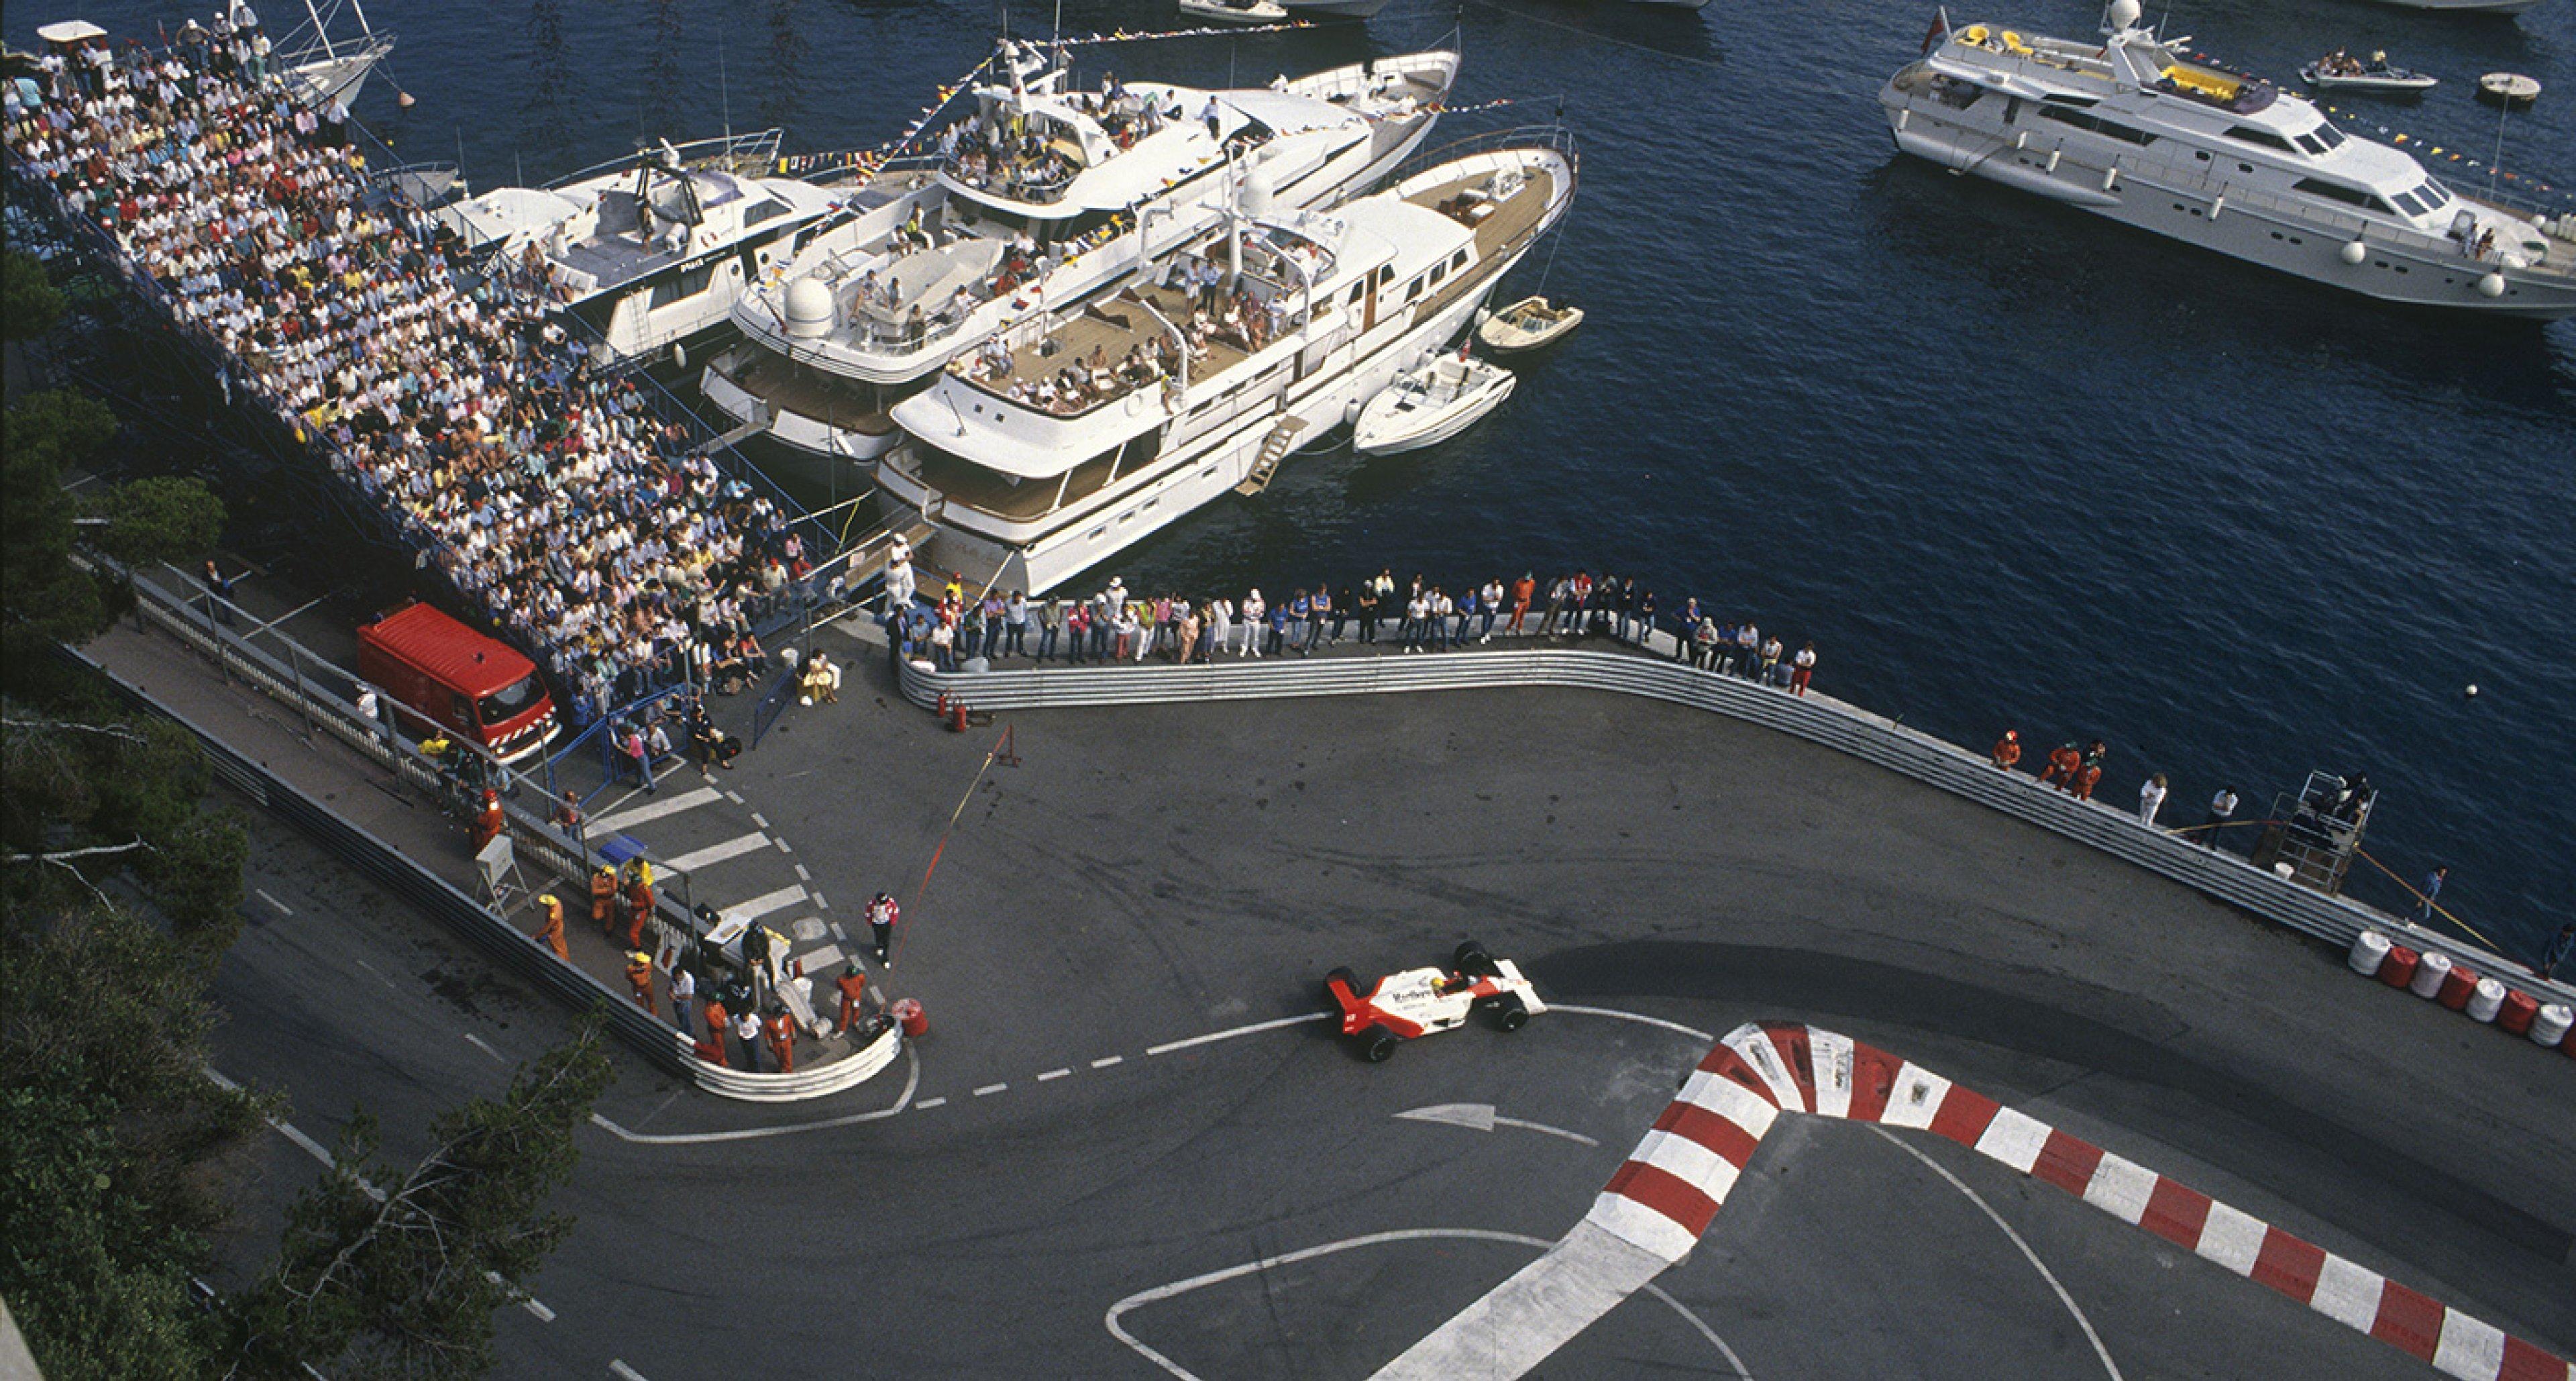 Ayrton Senna sets a legendary qualifying lap at the 1988 Monaco GP